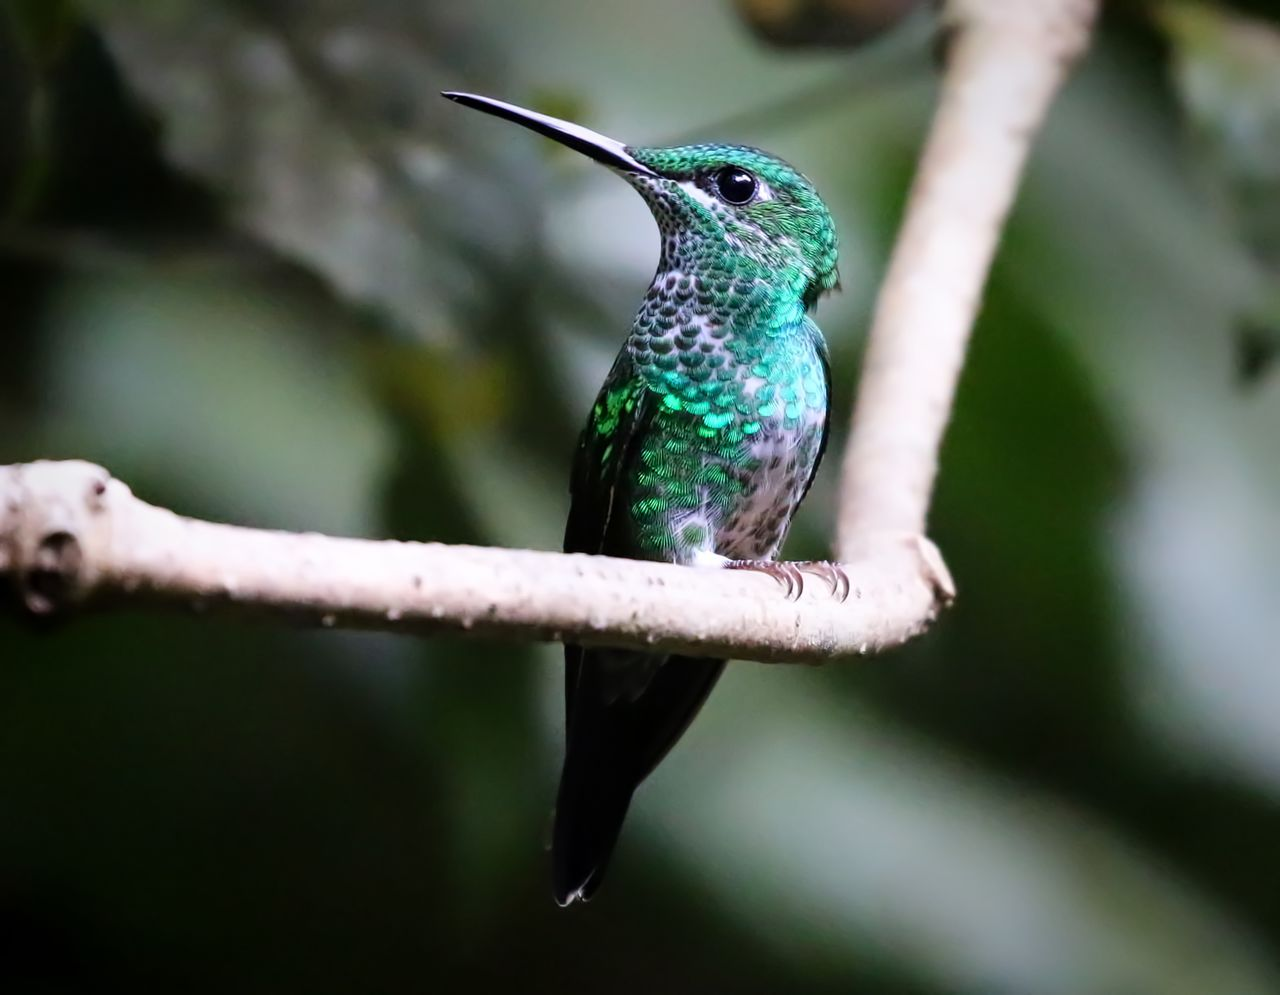 Close-Up Of Hummingbird Perching On Twig